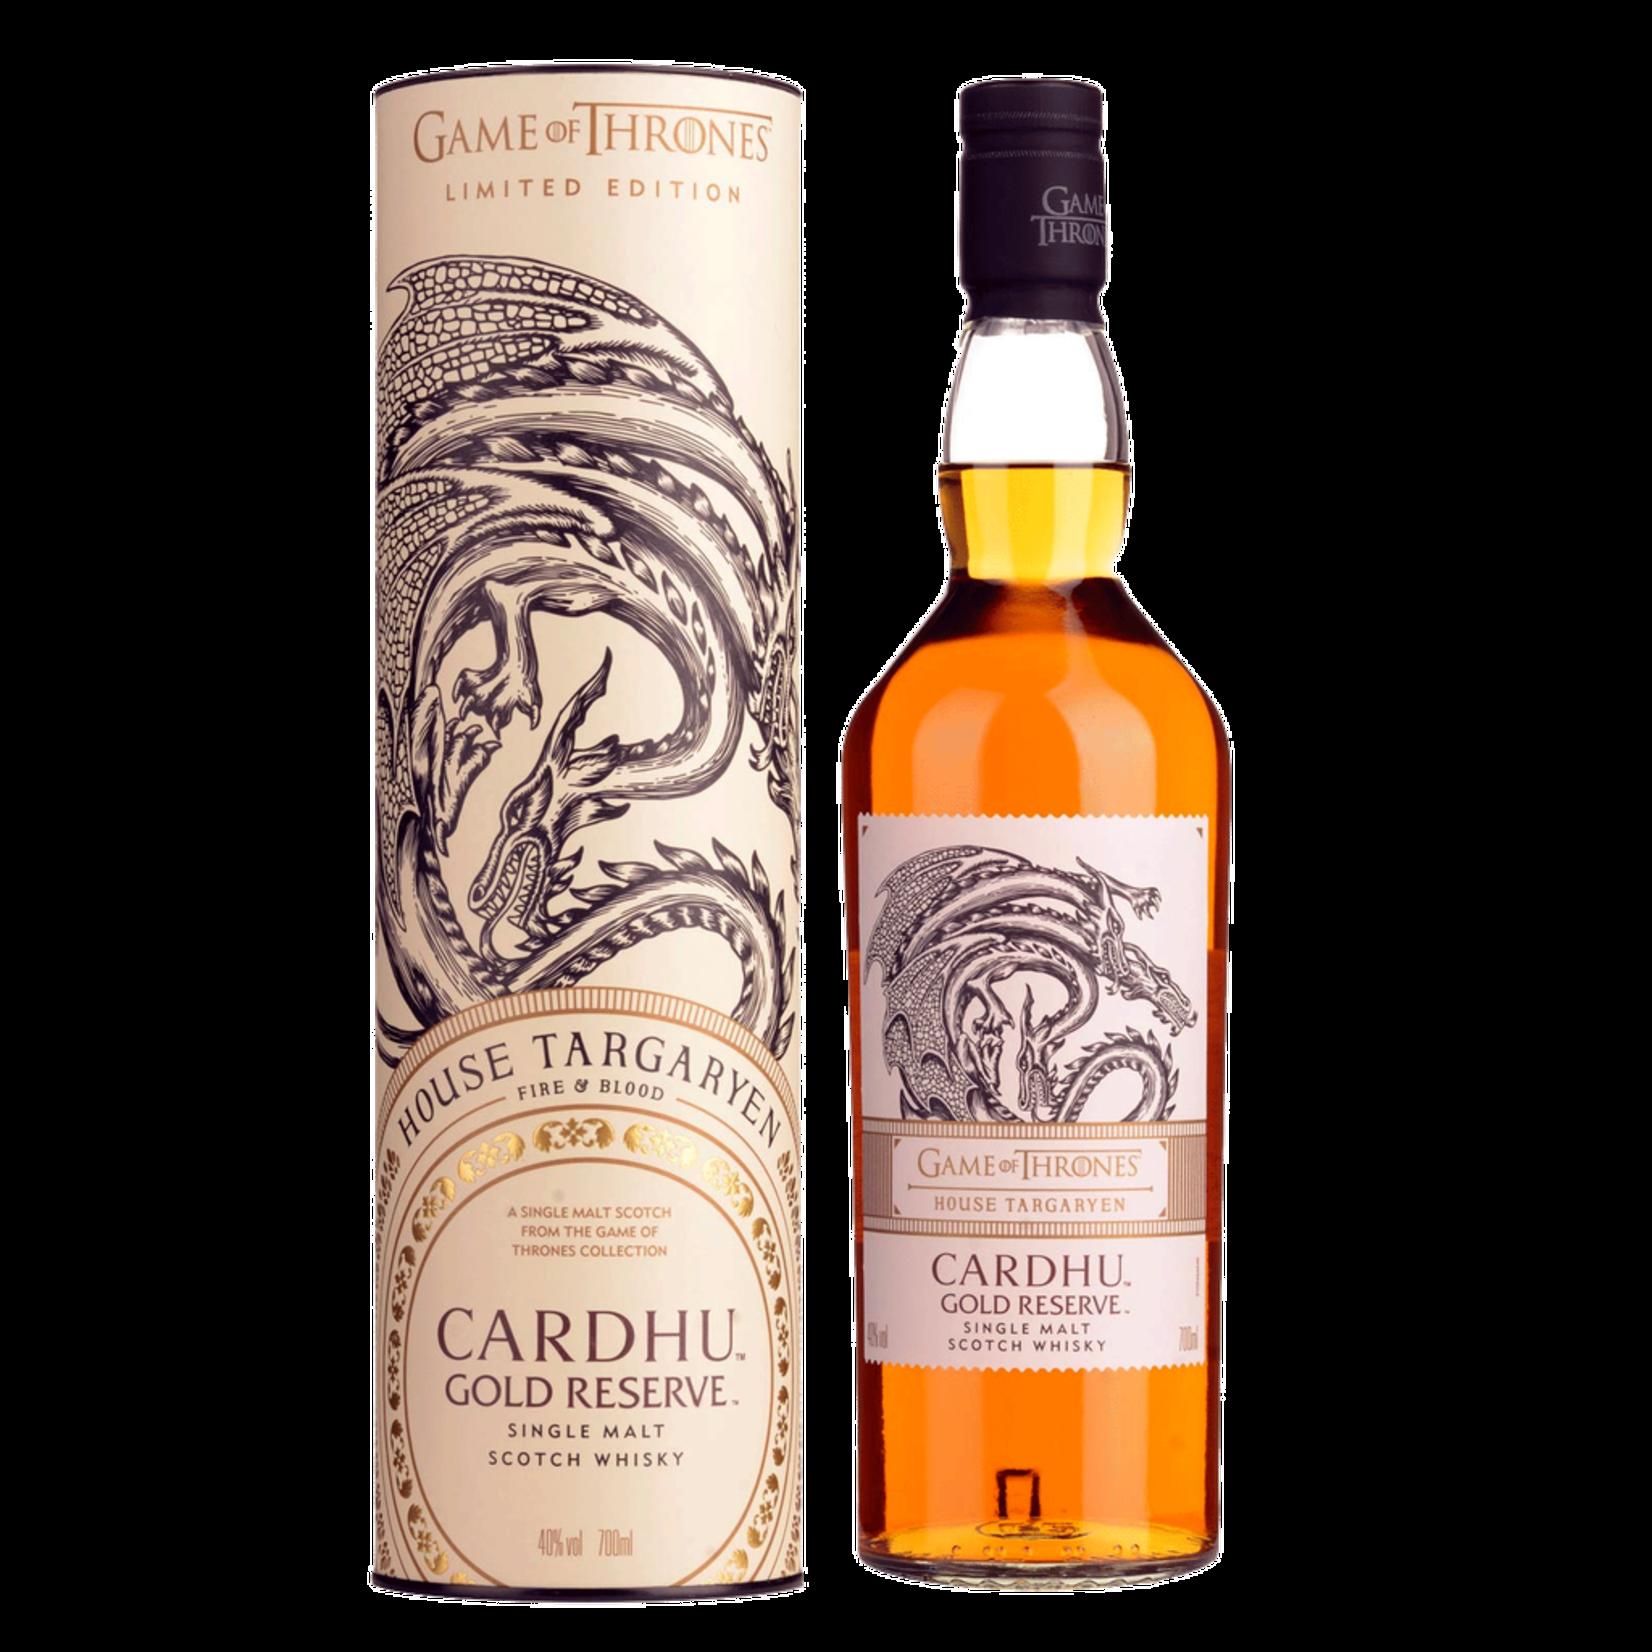 Spirits Game of Thrones House Targaryen Cardhu Gold Reserve Limited Edition Single Malt Scotch